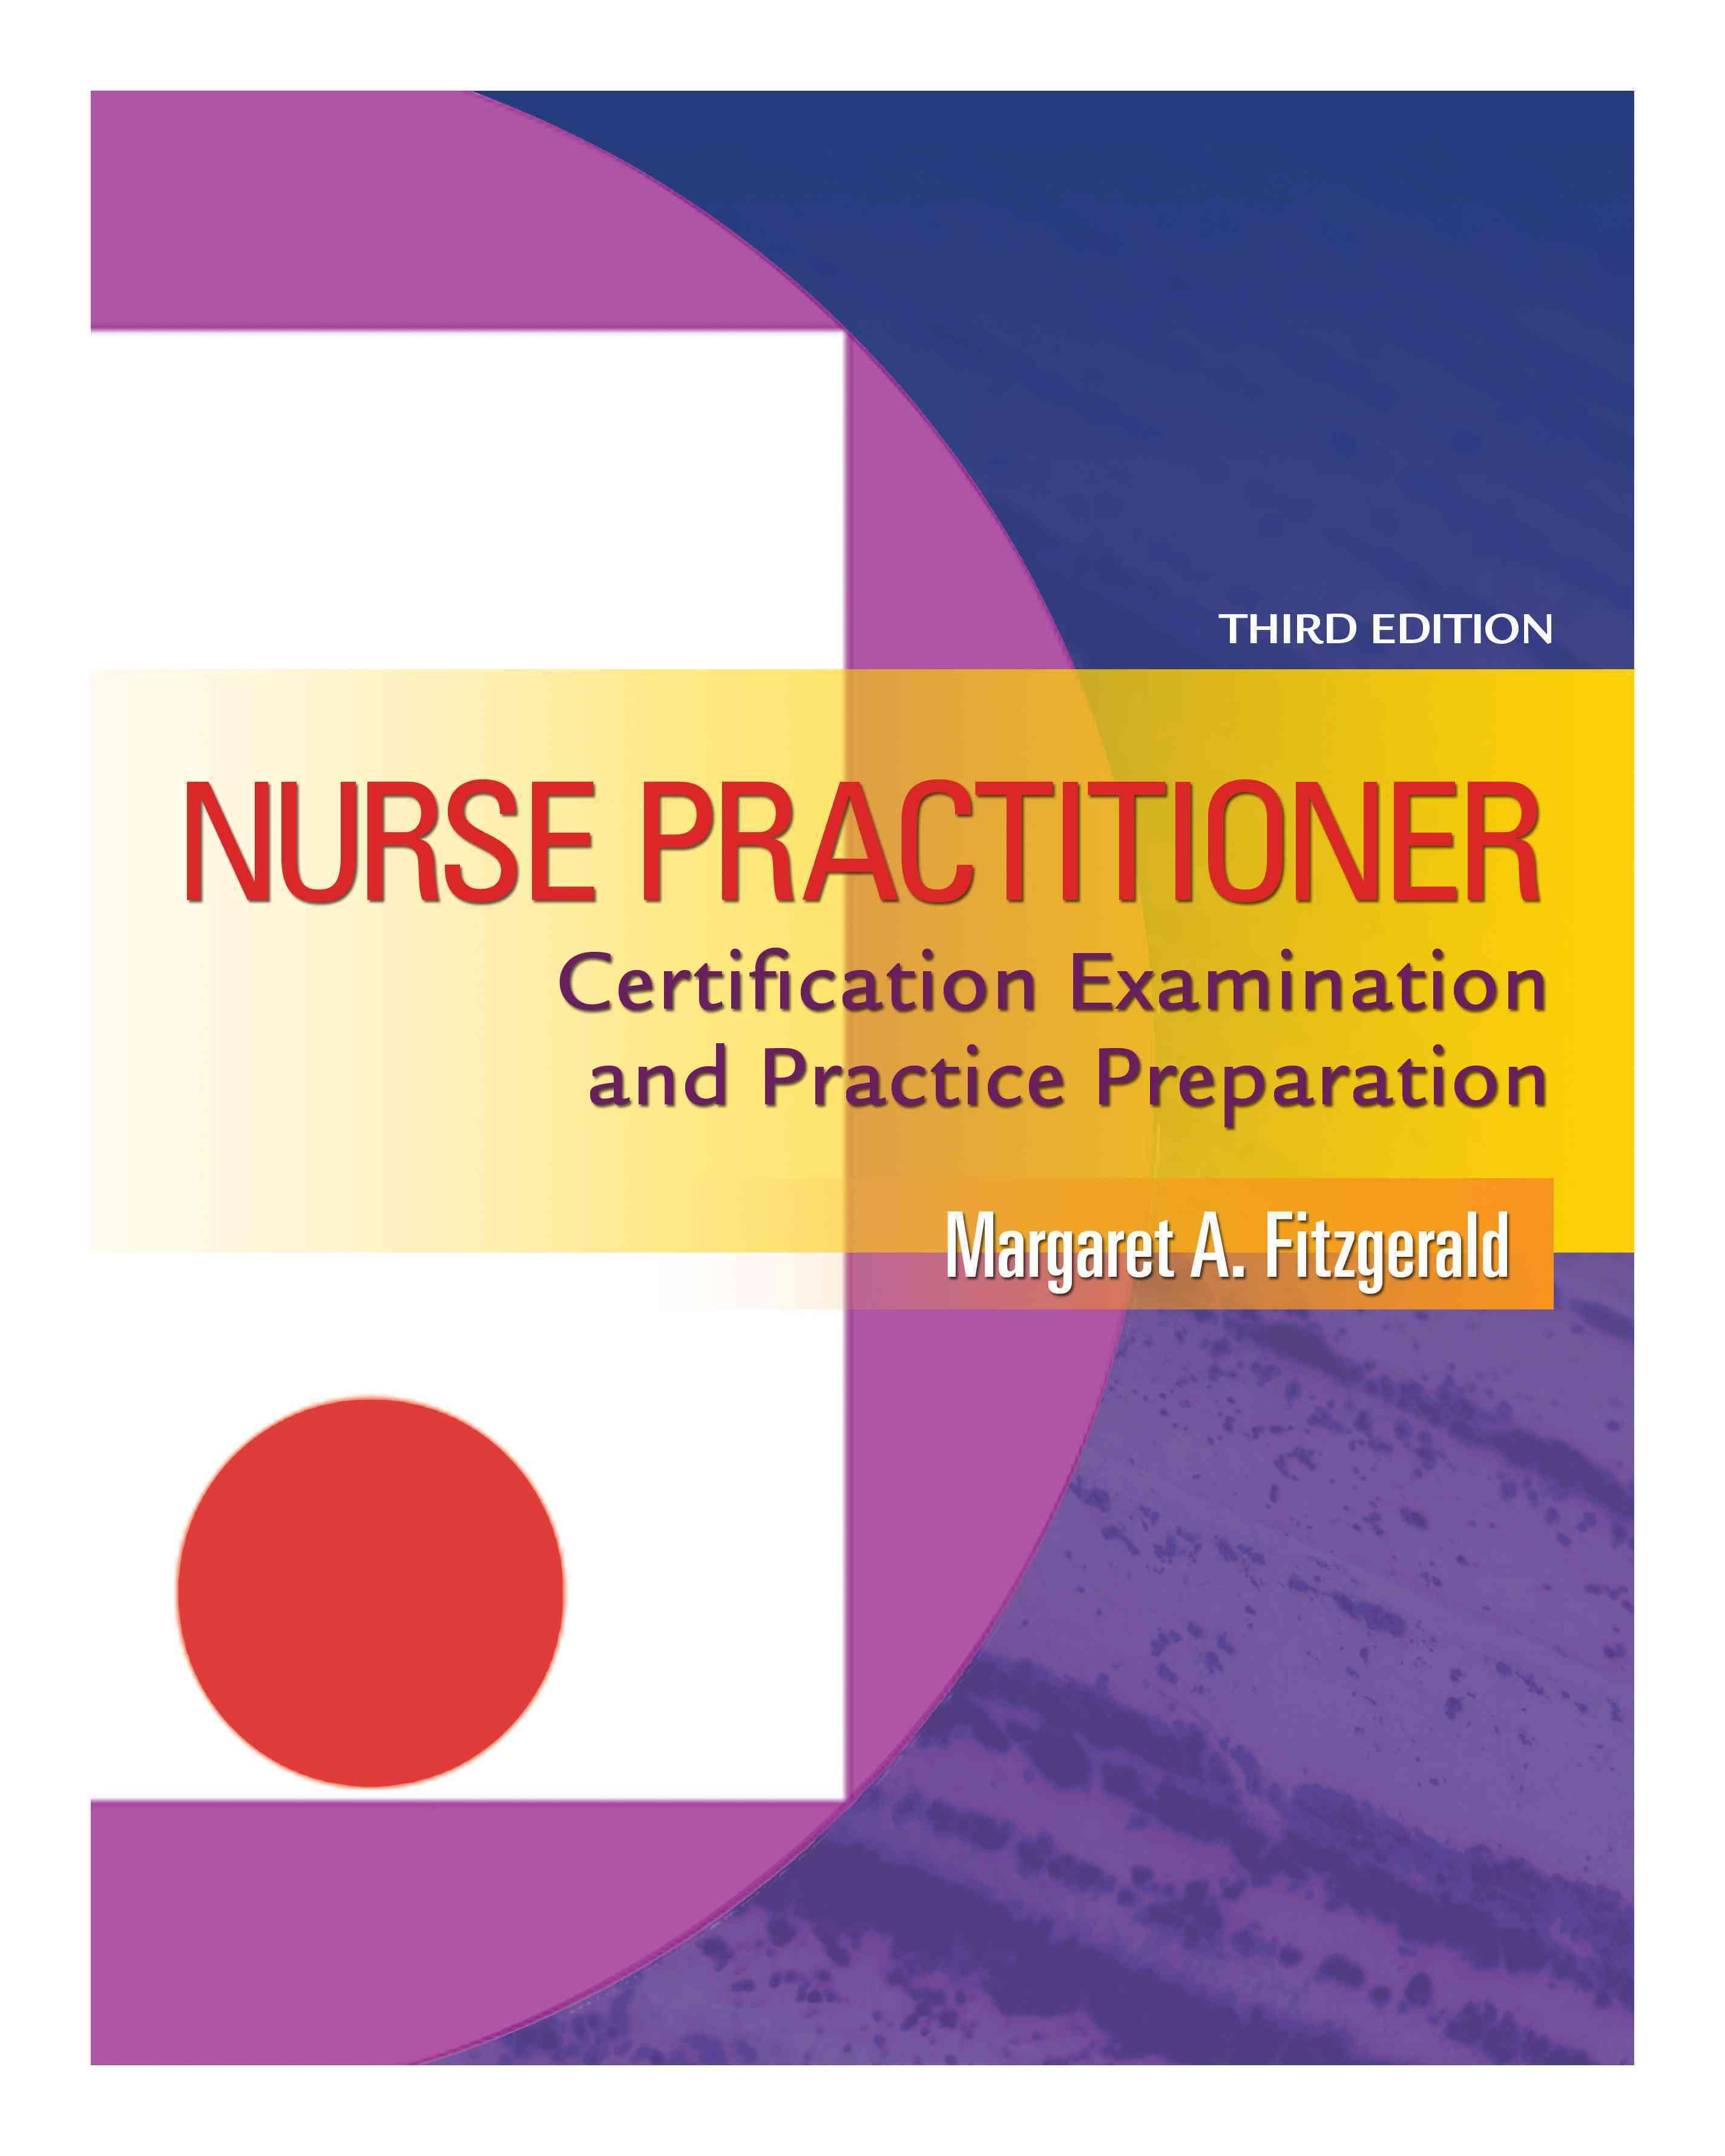 Nurse Practitioner Certification Examination and Practice Preparation (Paperback)